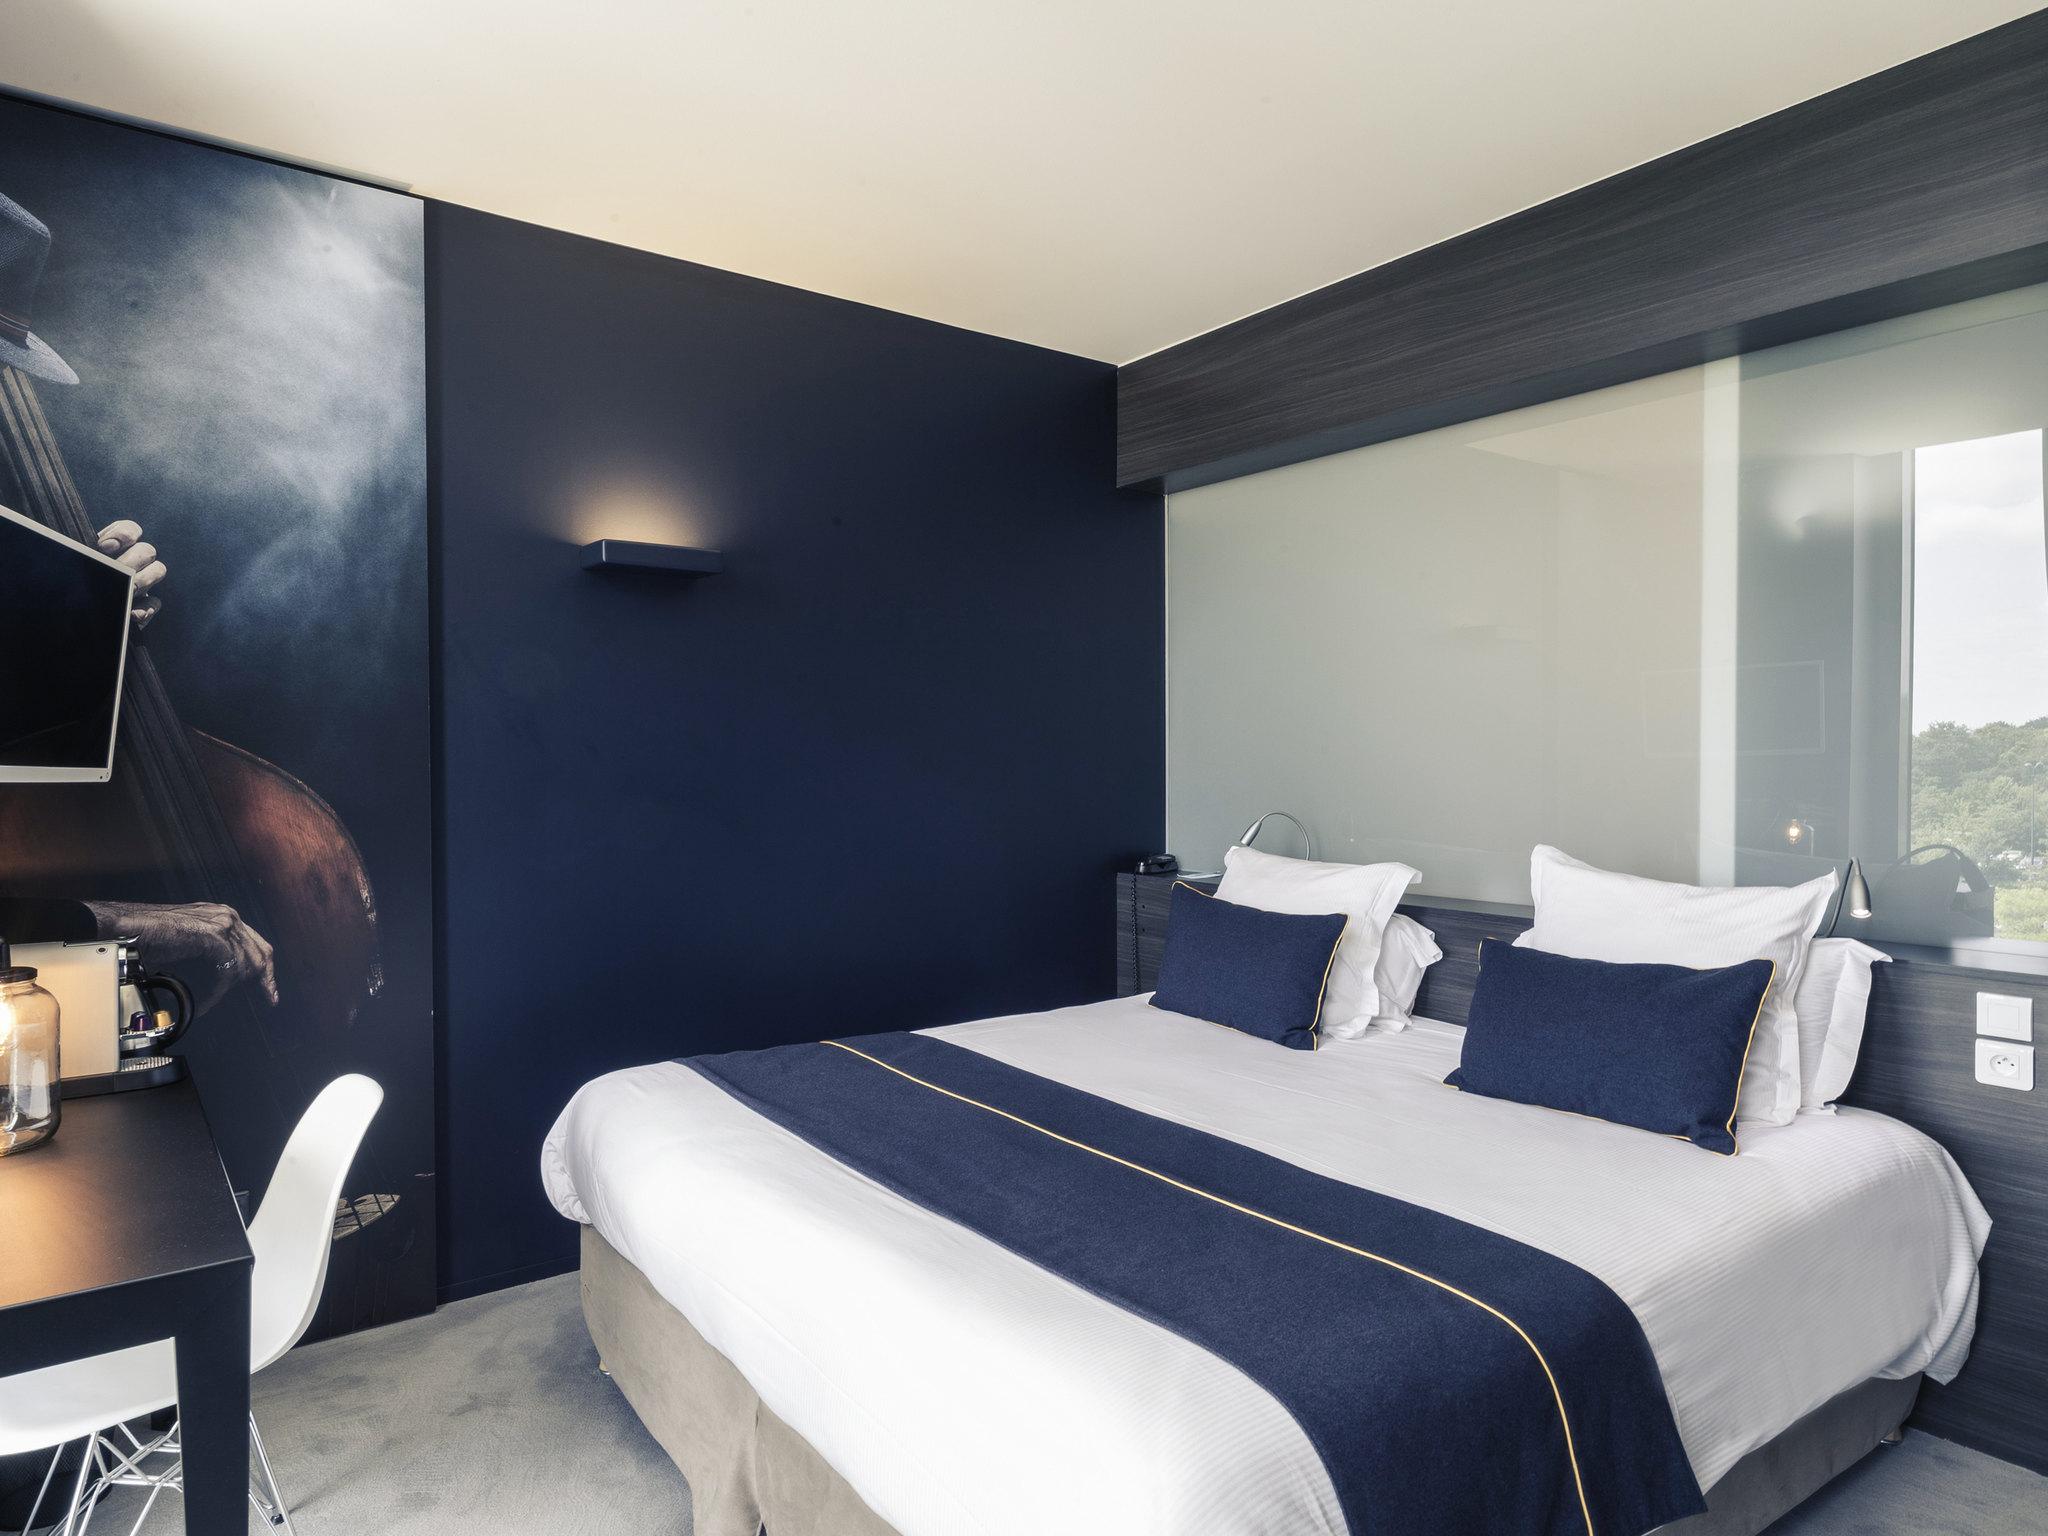 Hotel – Hôtel Mercure Zénith Nantes Saint-Herblain